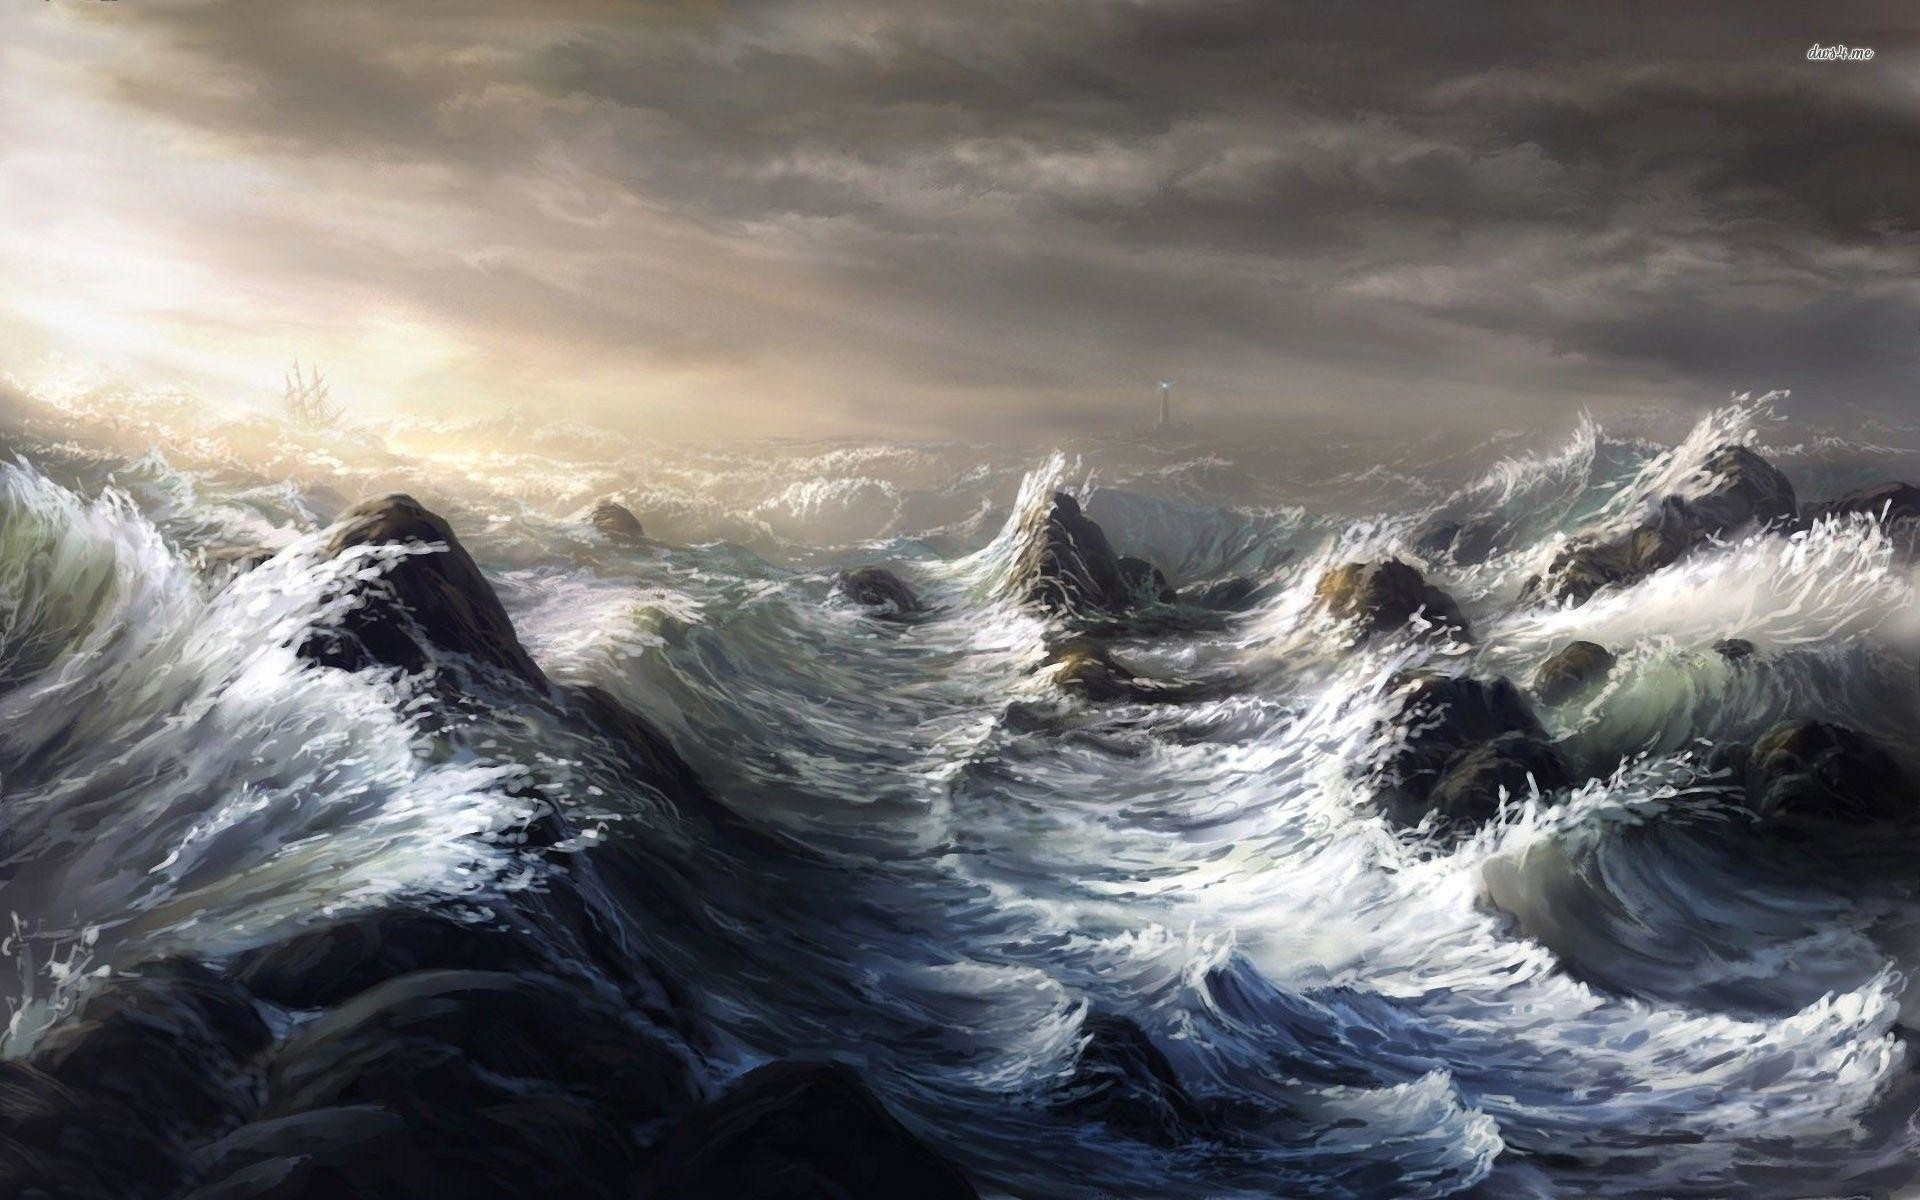 Ocean Storm Wallpapers – Full HD wallpaper search